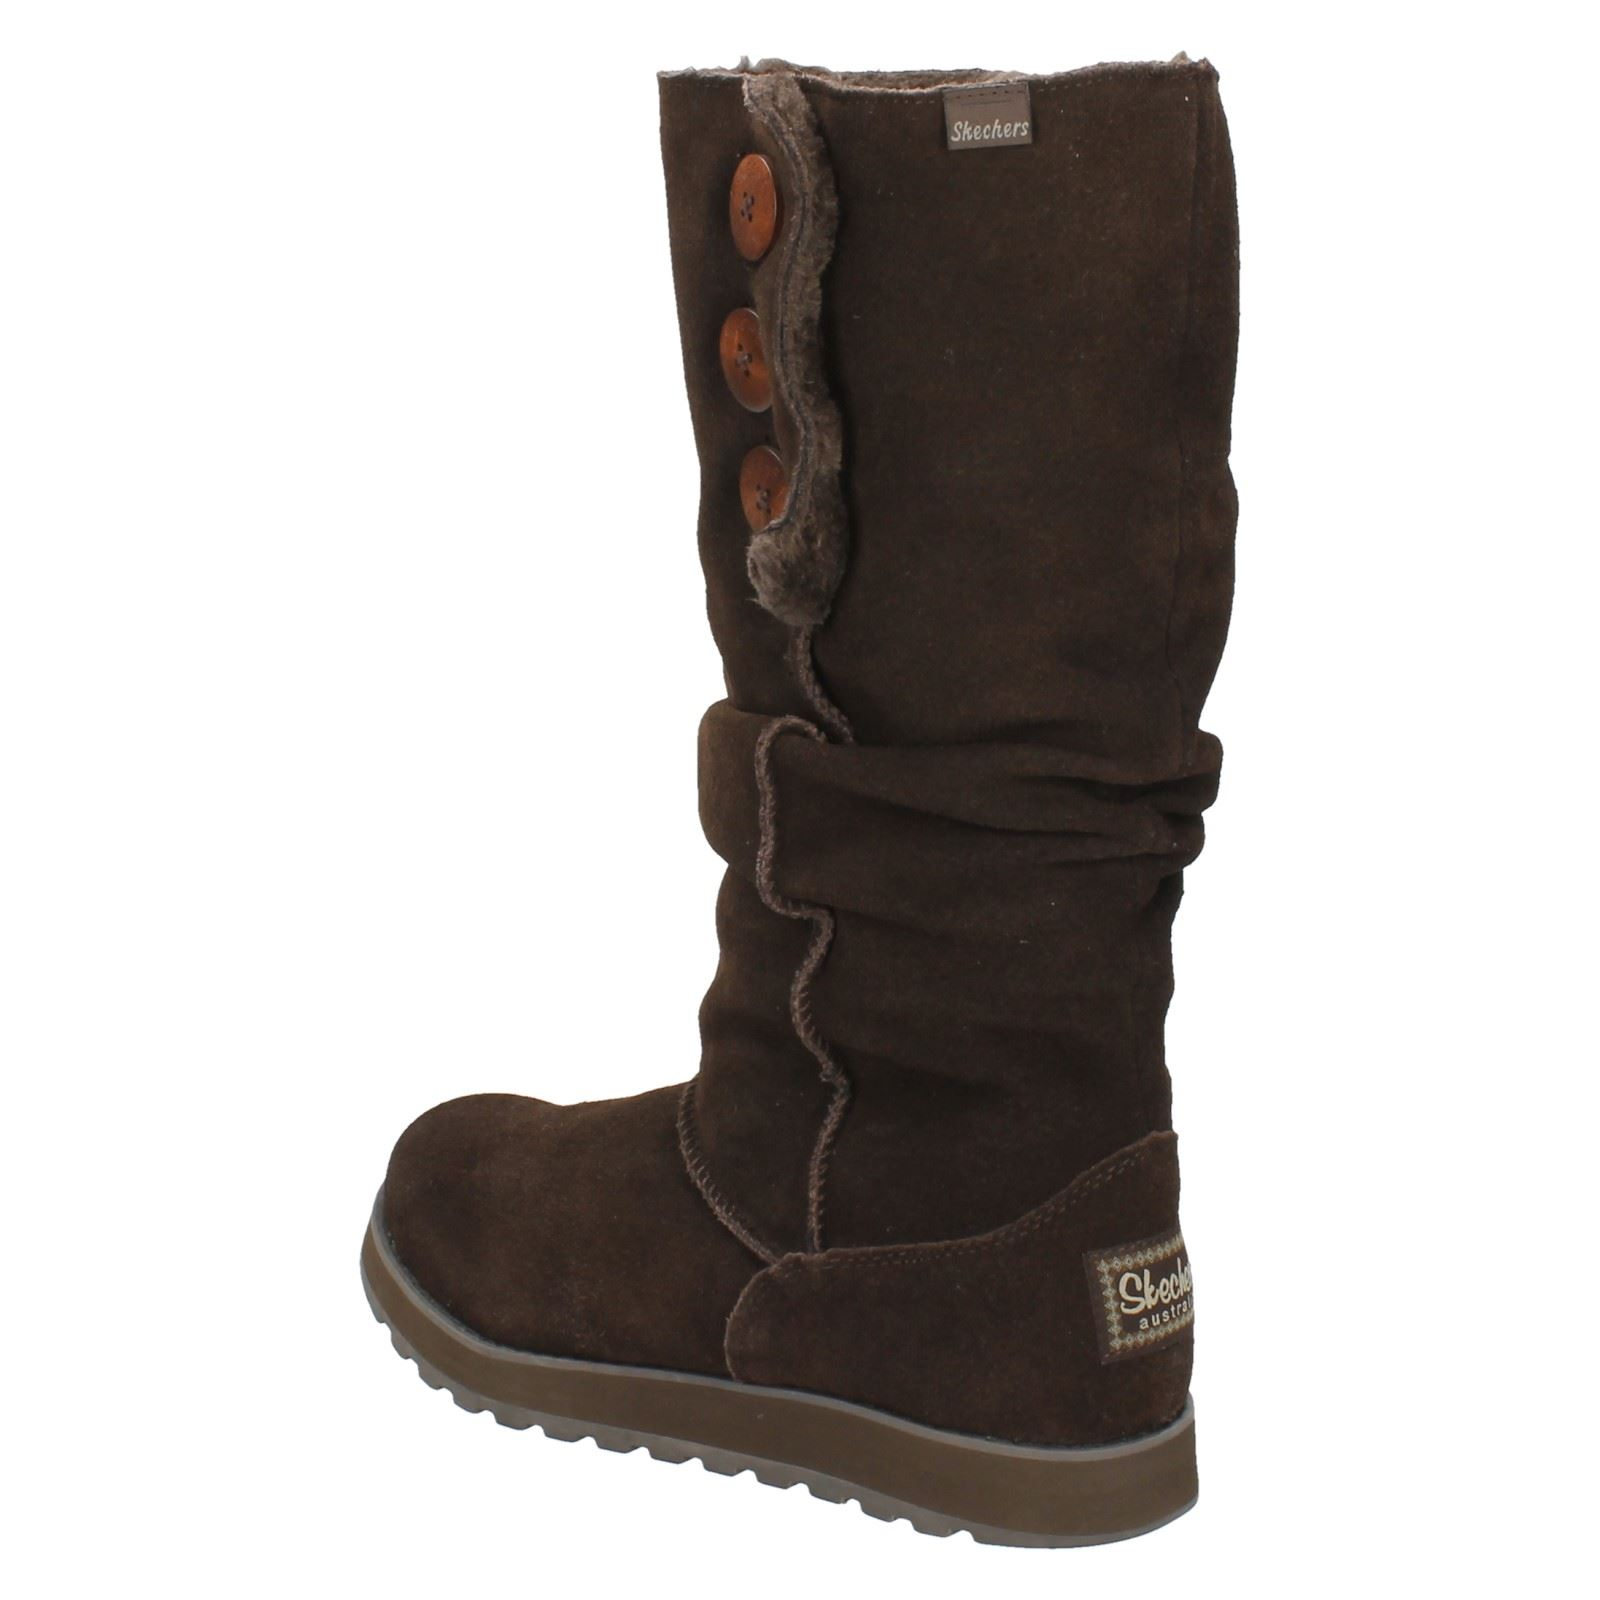 skechers calf length boots keep sakes